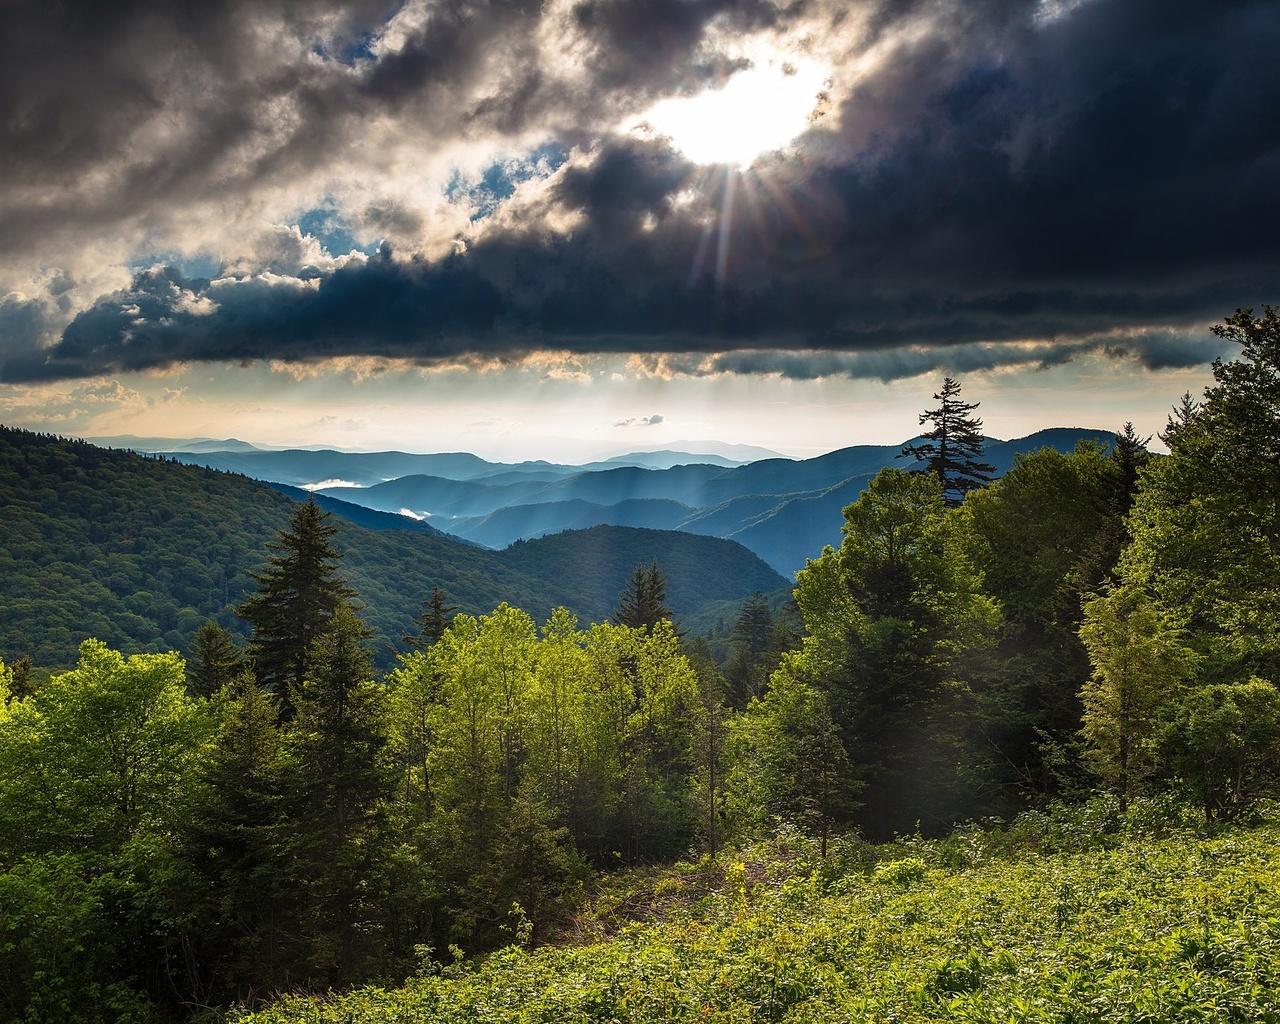 природа, пейзаж, лето, холмы, леса, склон, тучи, солнце, лучи